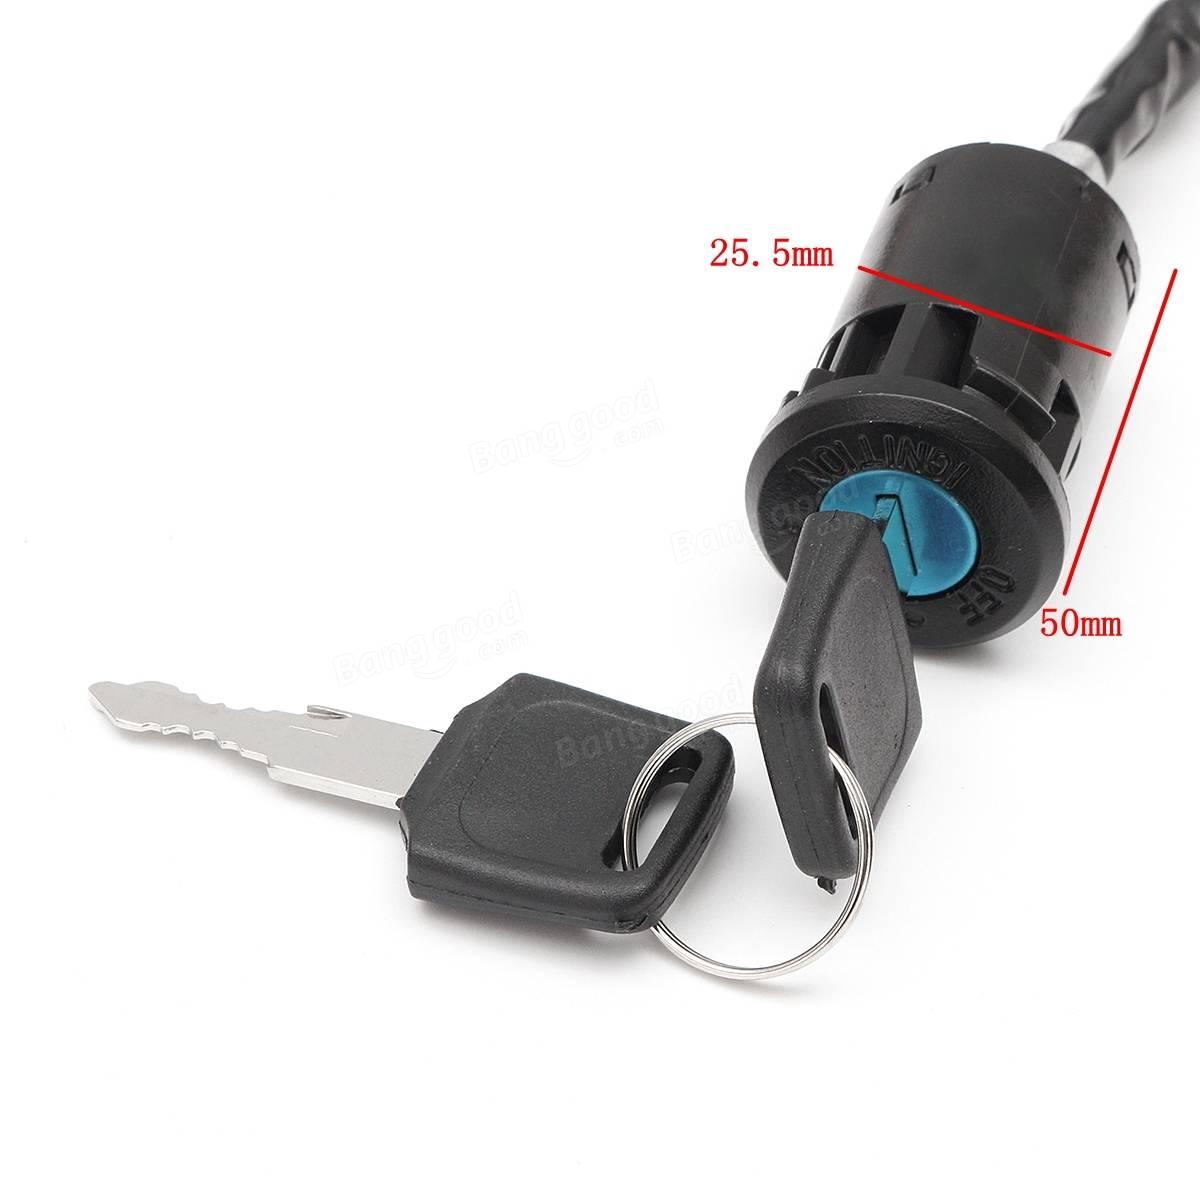 viper 350 hv wiring diagram wb statesman dash get free image about